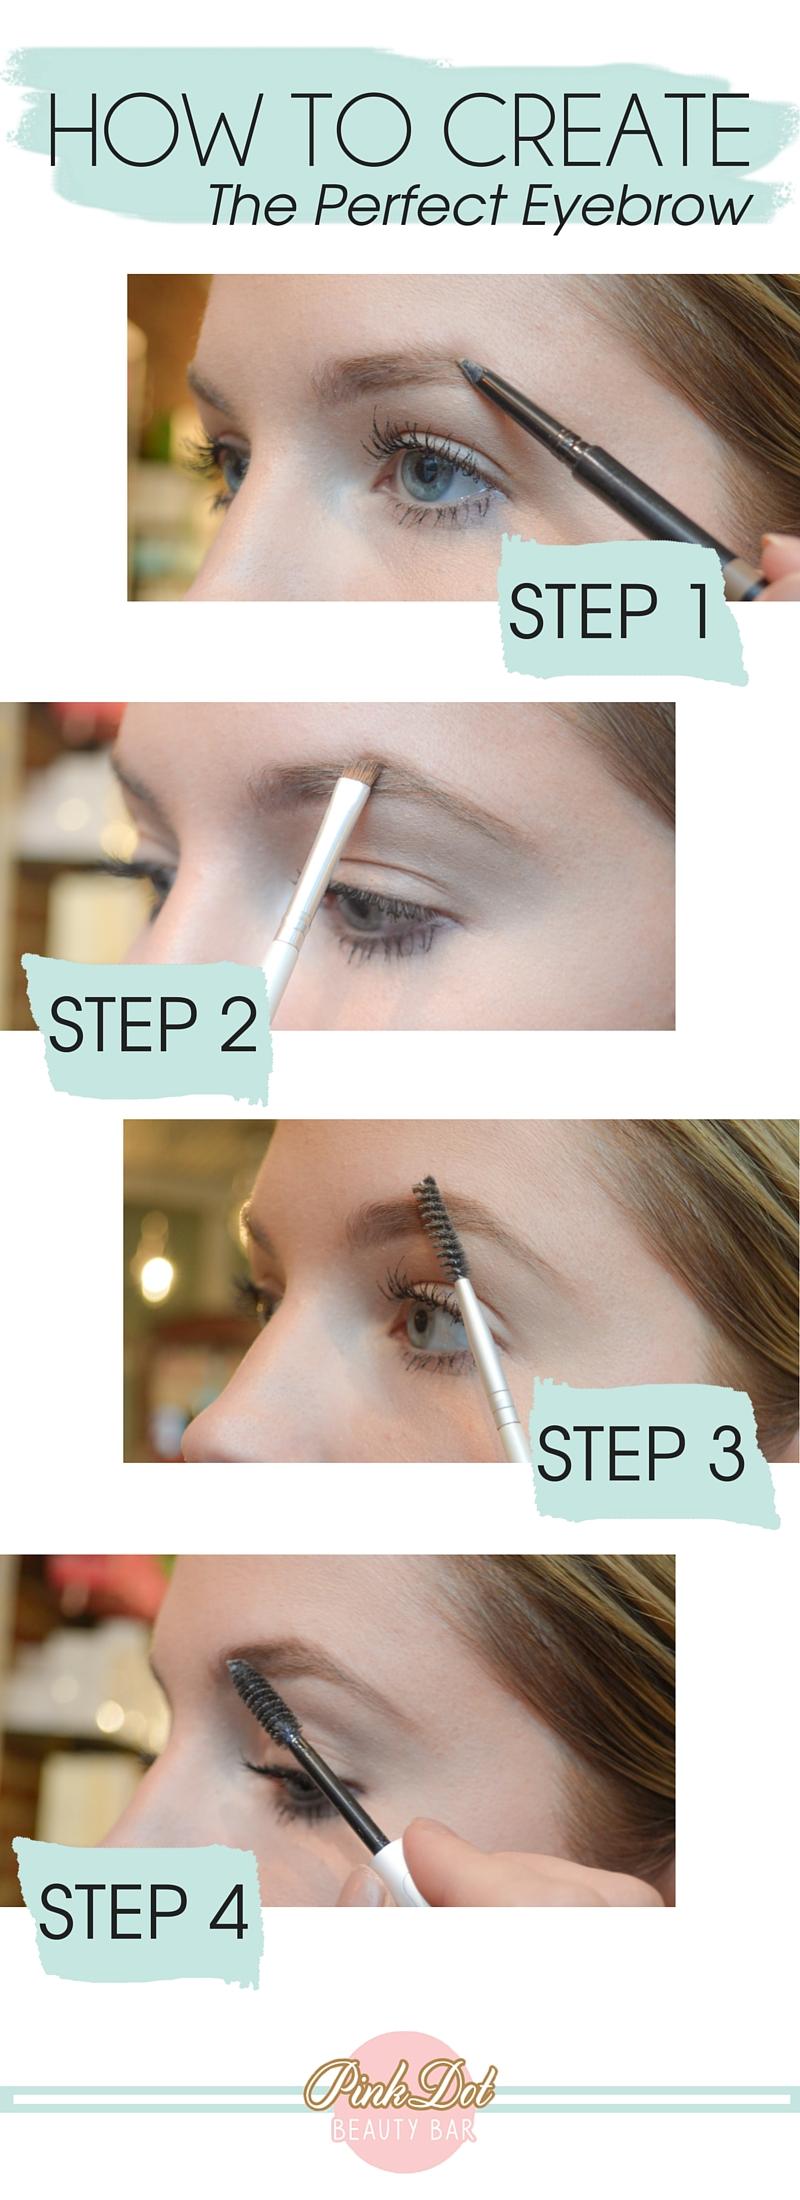 How to create the perfect eyebrow - step by step via @pinkdotbeauty